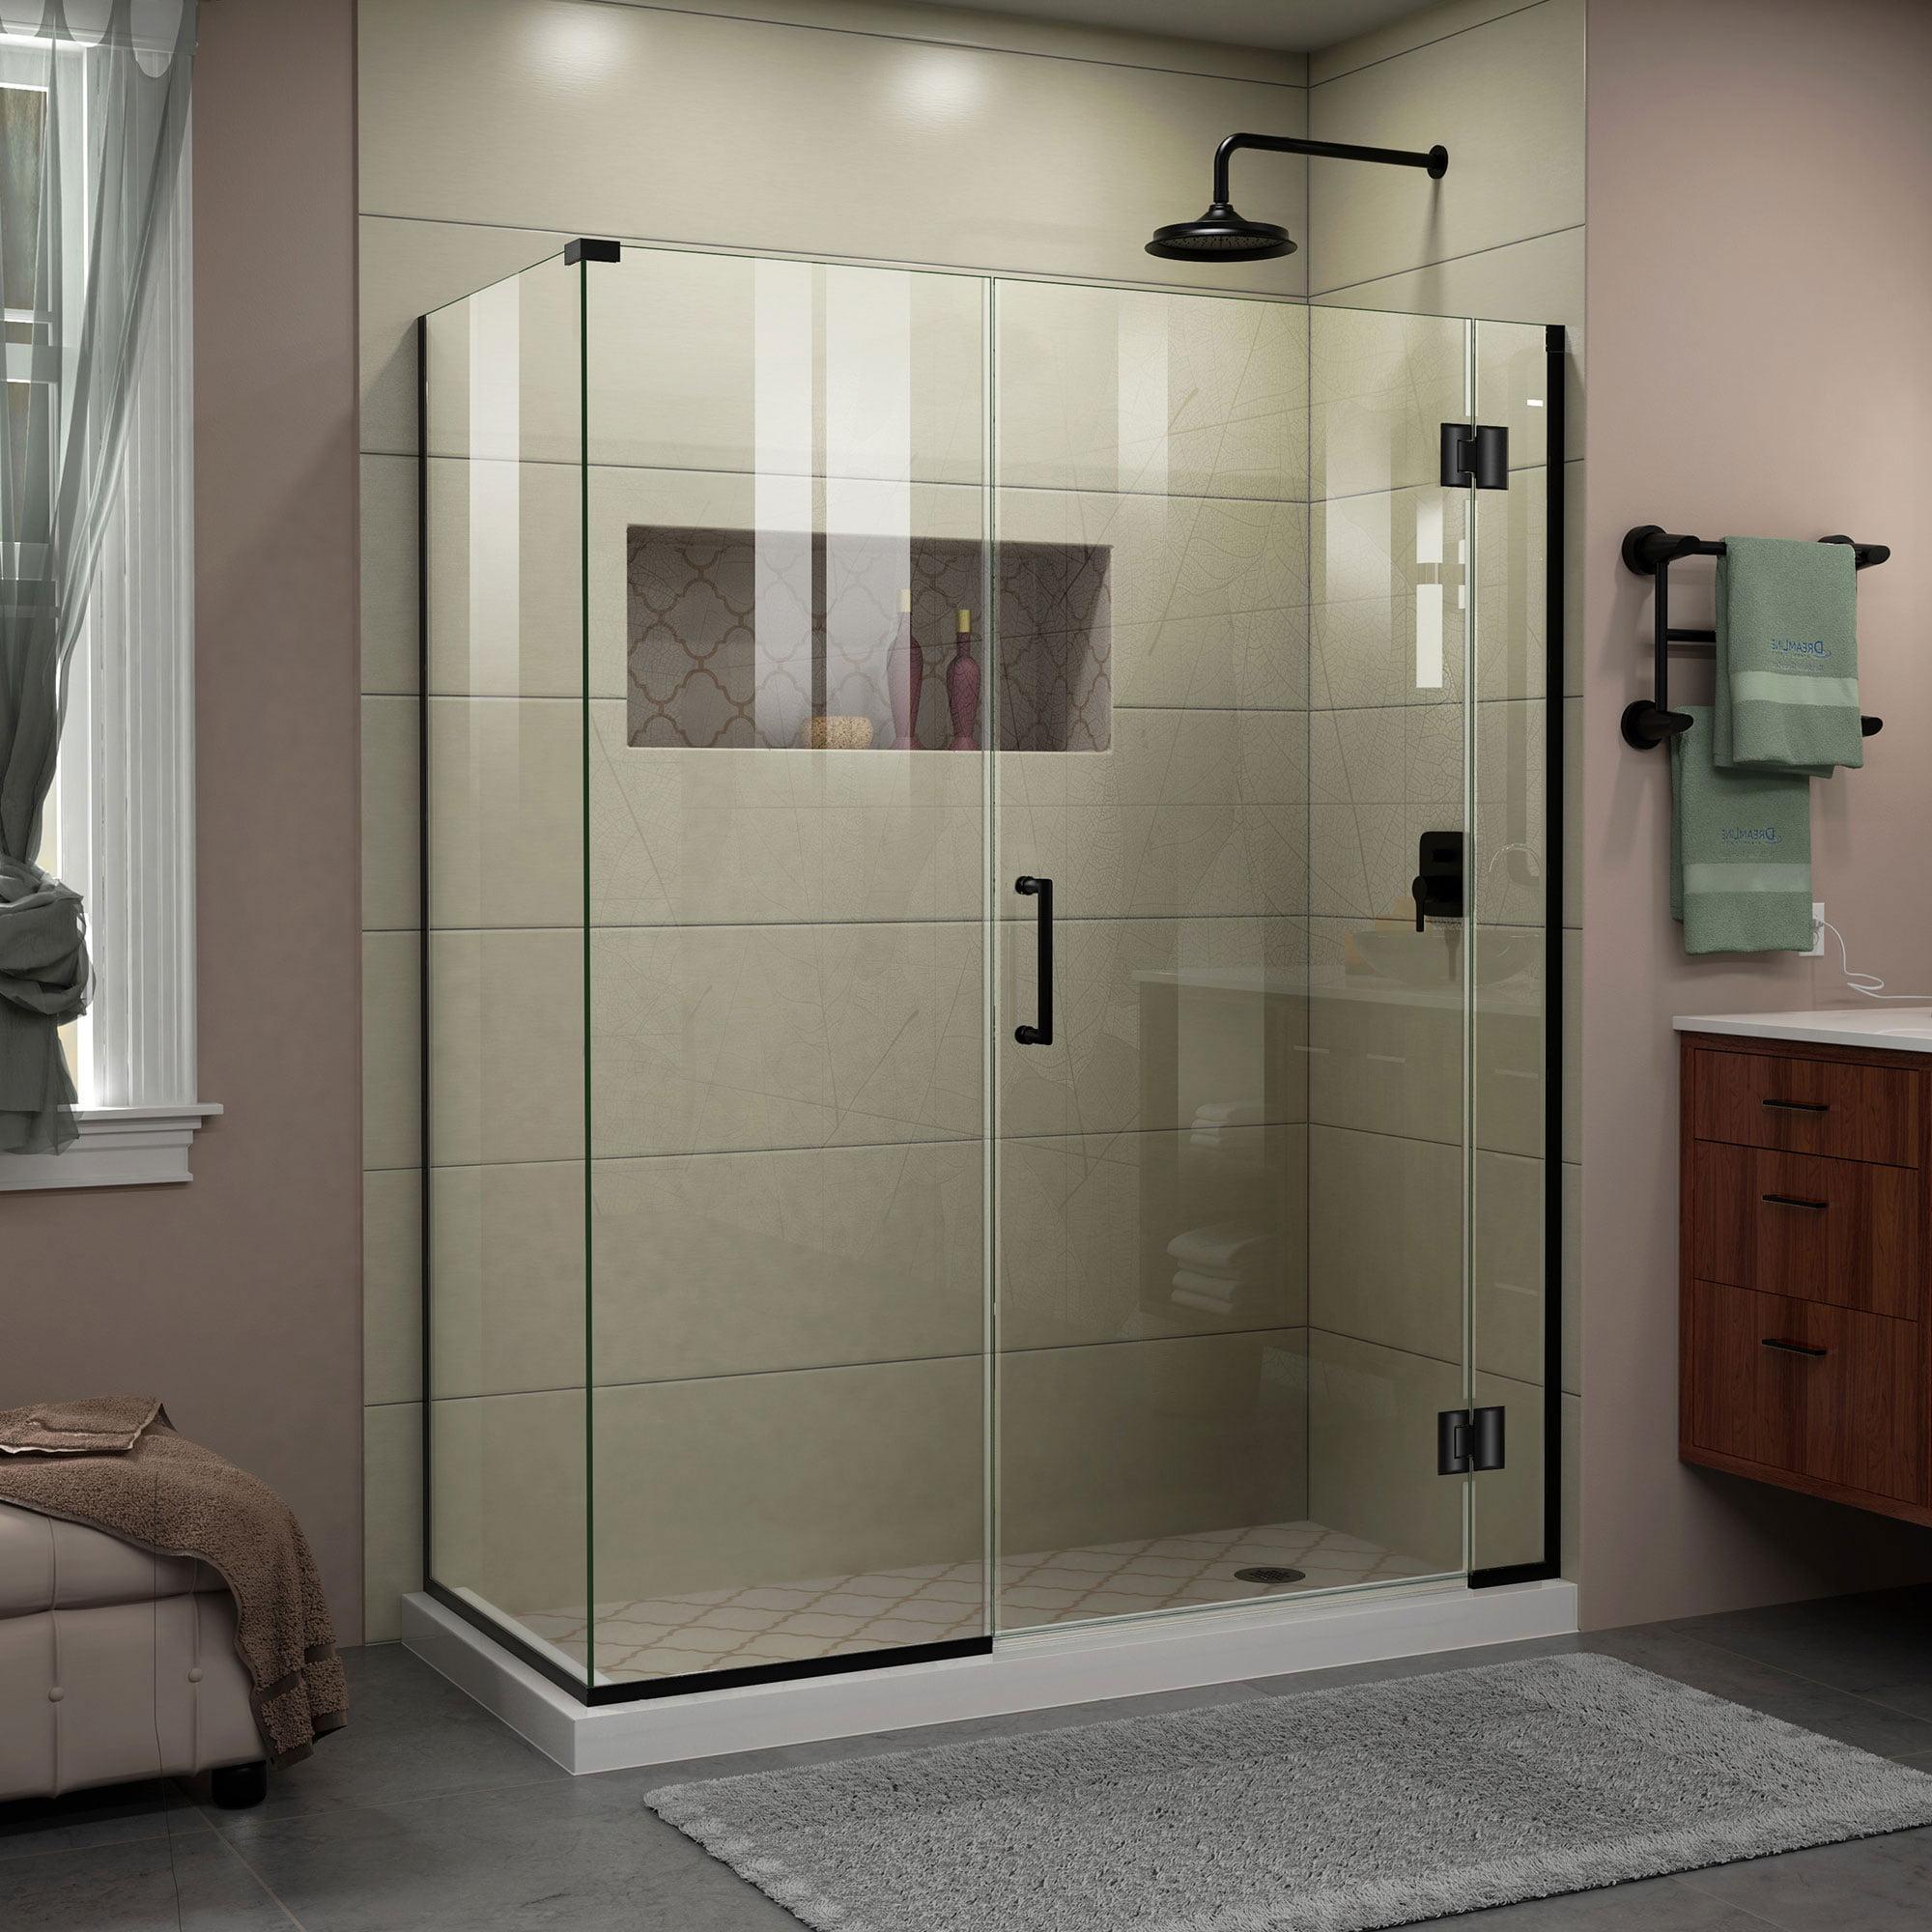 DreamLine Unidoor-X 46 in. W x 34 3/8 in. D x 72 in. H Frameless Hinged Shower Enclosure in Satin Black